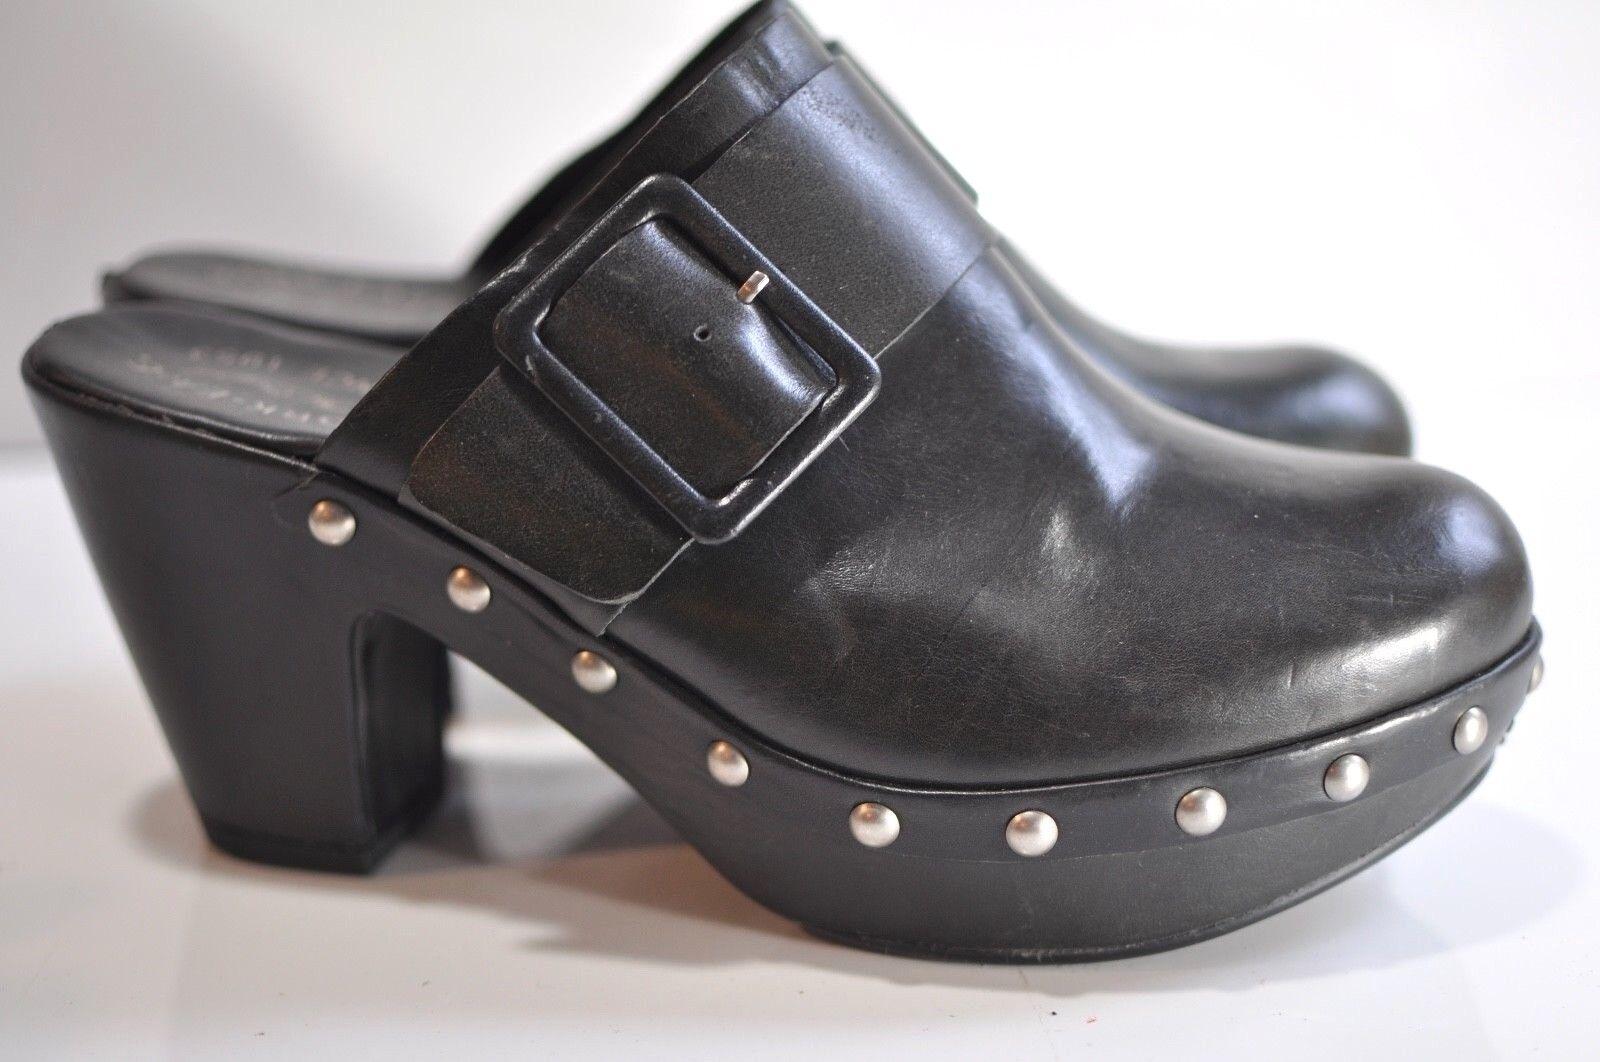 Kork-Ease damen Studded schwarz leather clog Größe 10 M EU 42